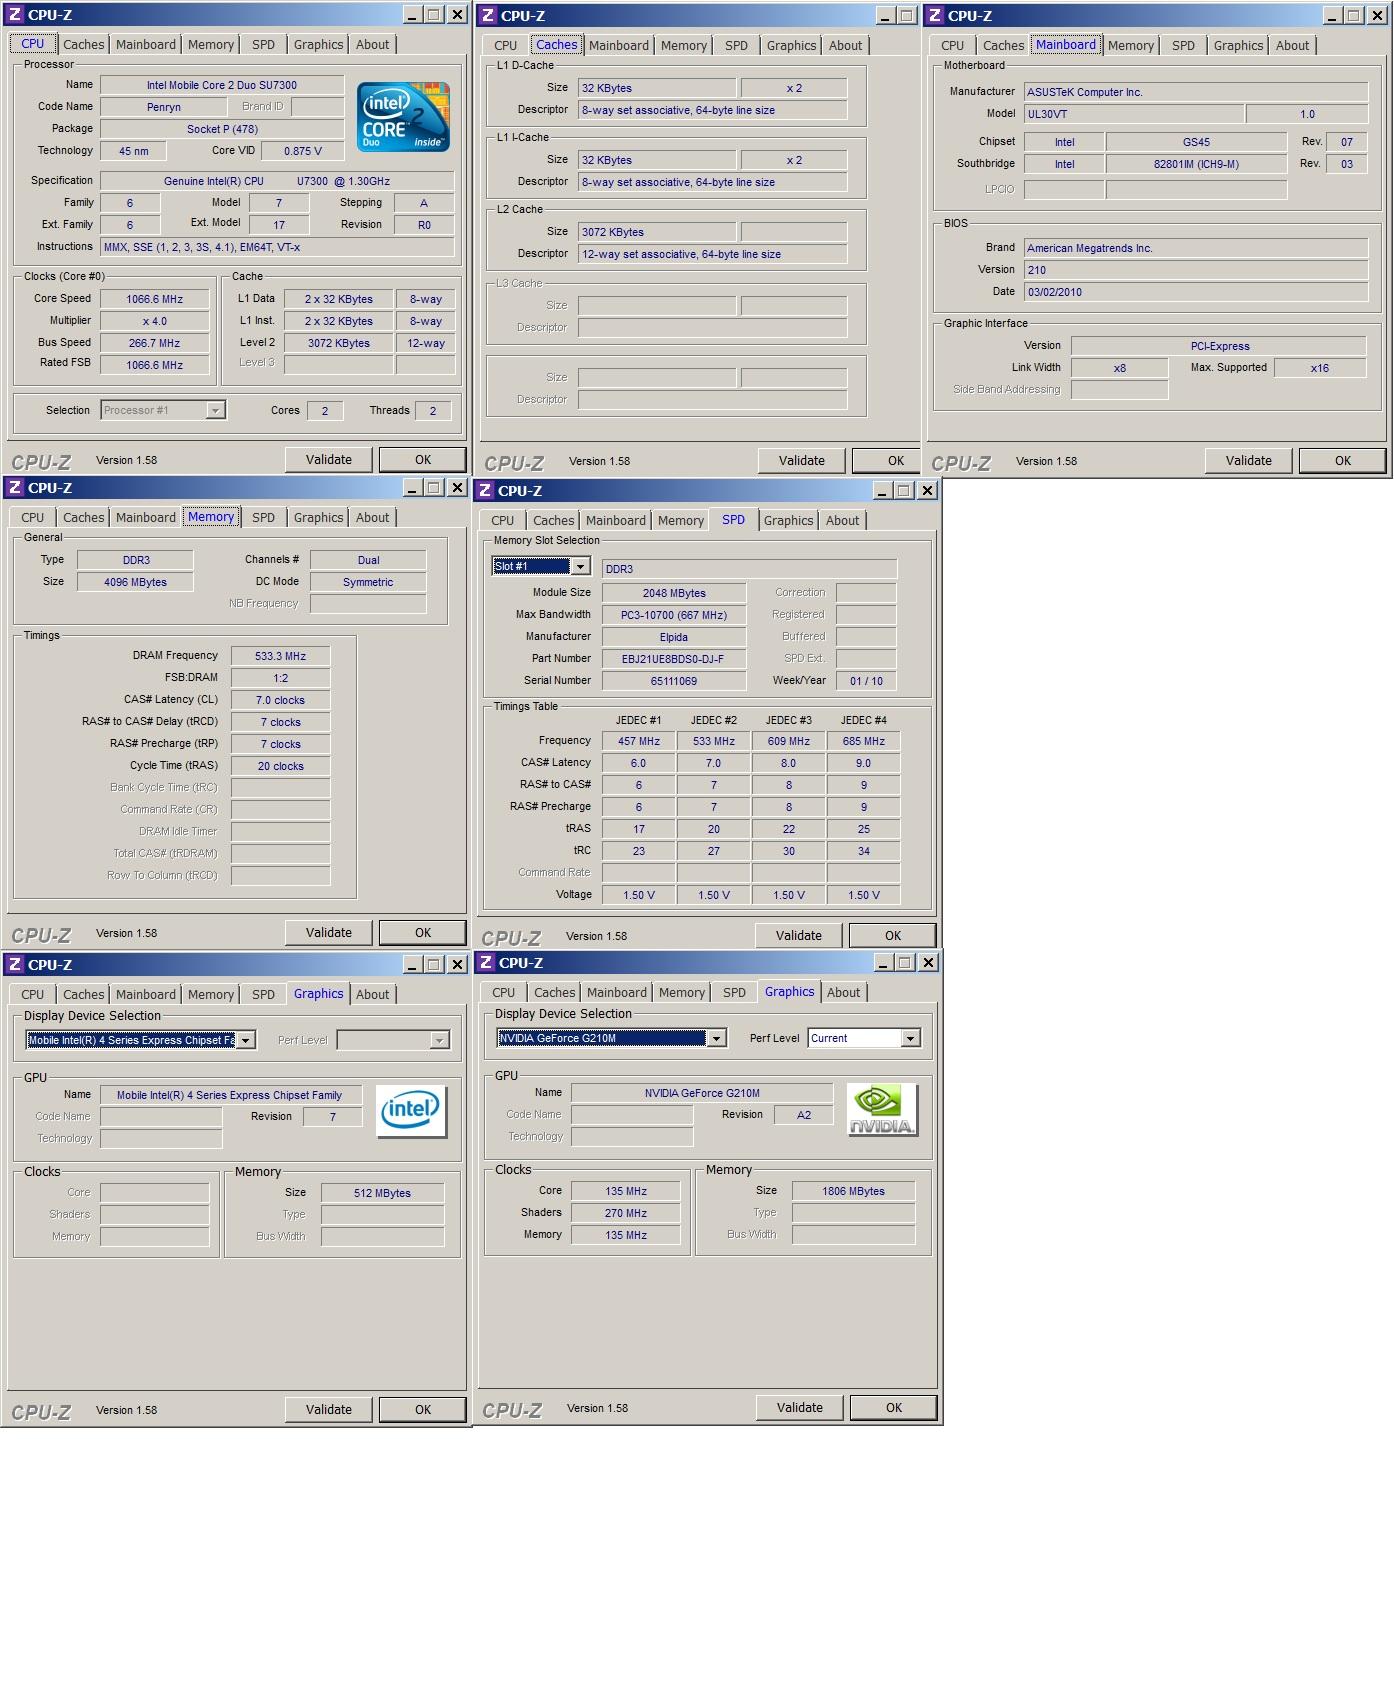 Asus UL30VT-QX009 rozszerzanie pami�� RAM?